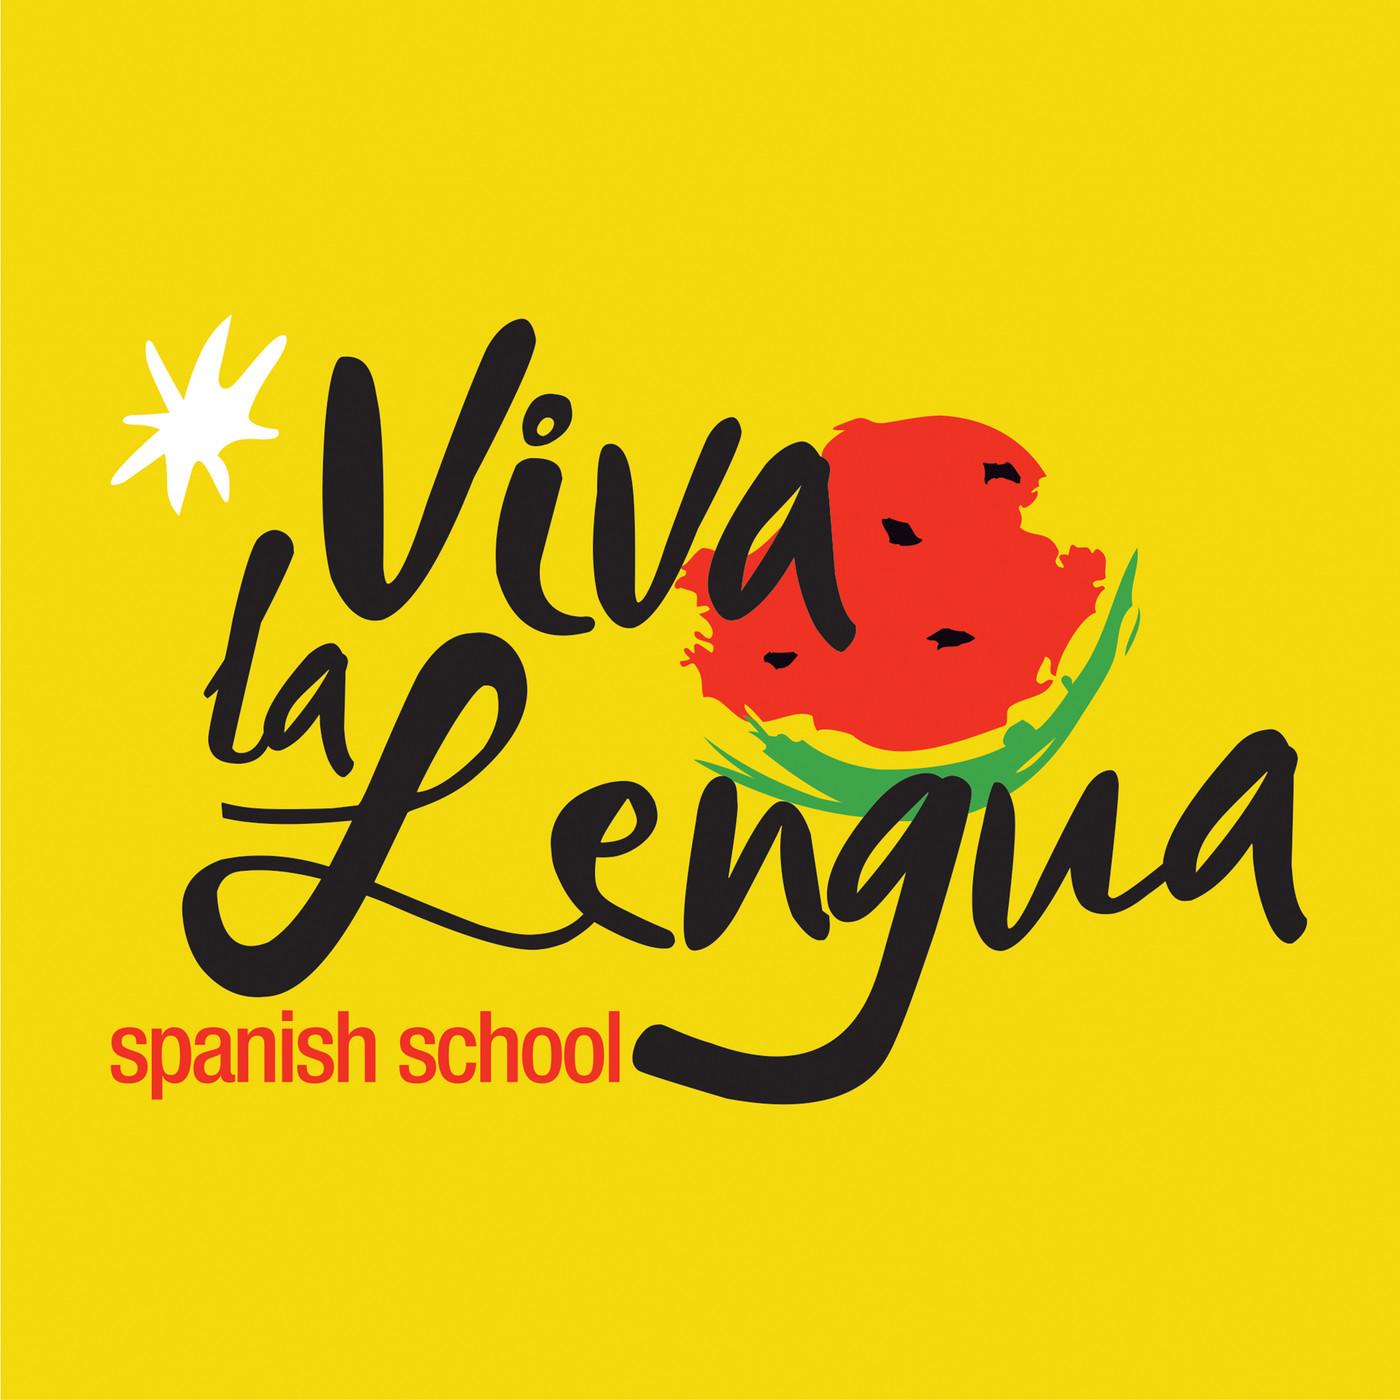 Viva la Lengua 01 - Desde México con Marisol